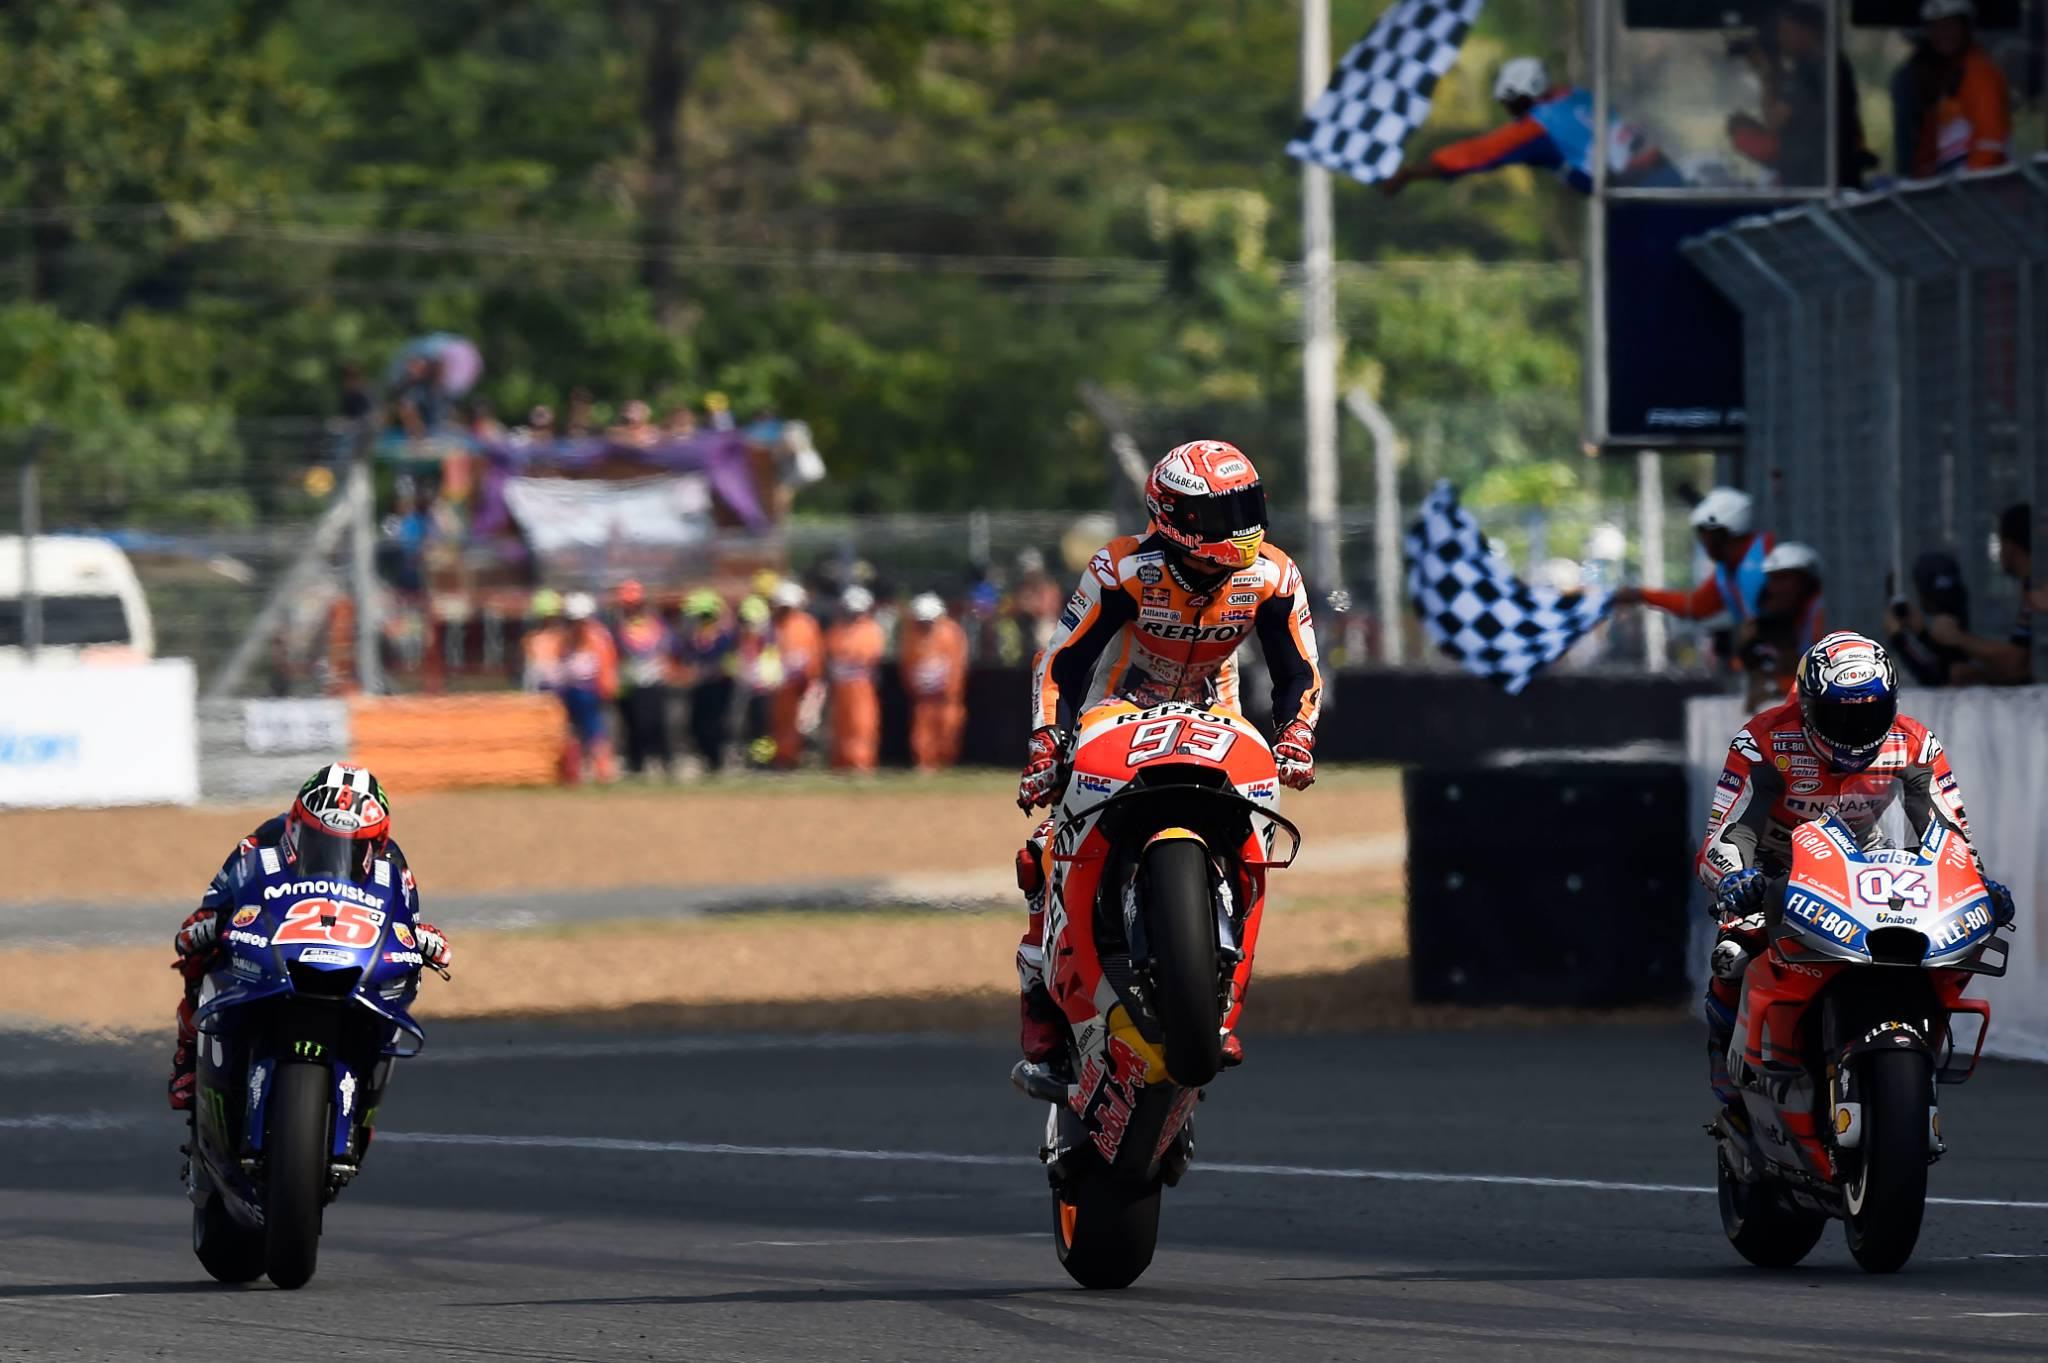 MotoGP – Thailand wins the 2018 Best GP award